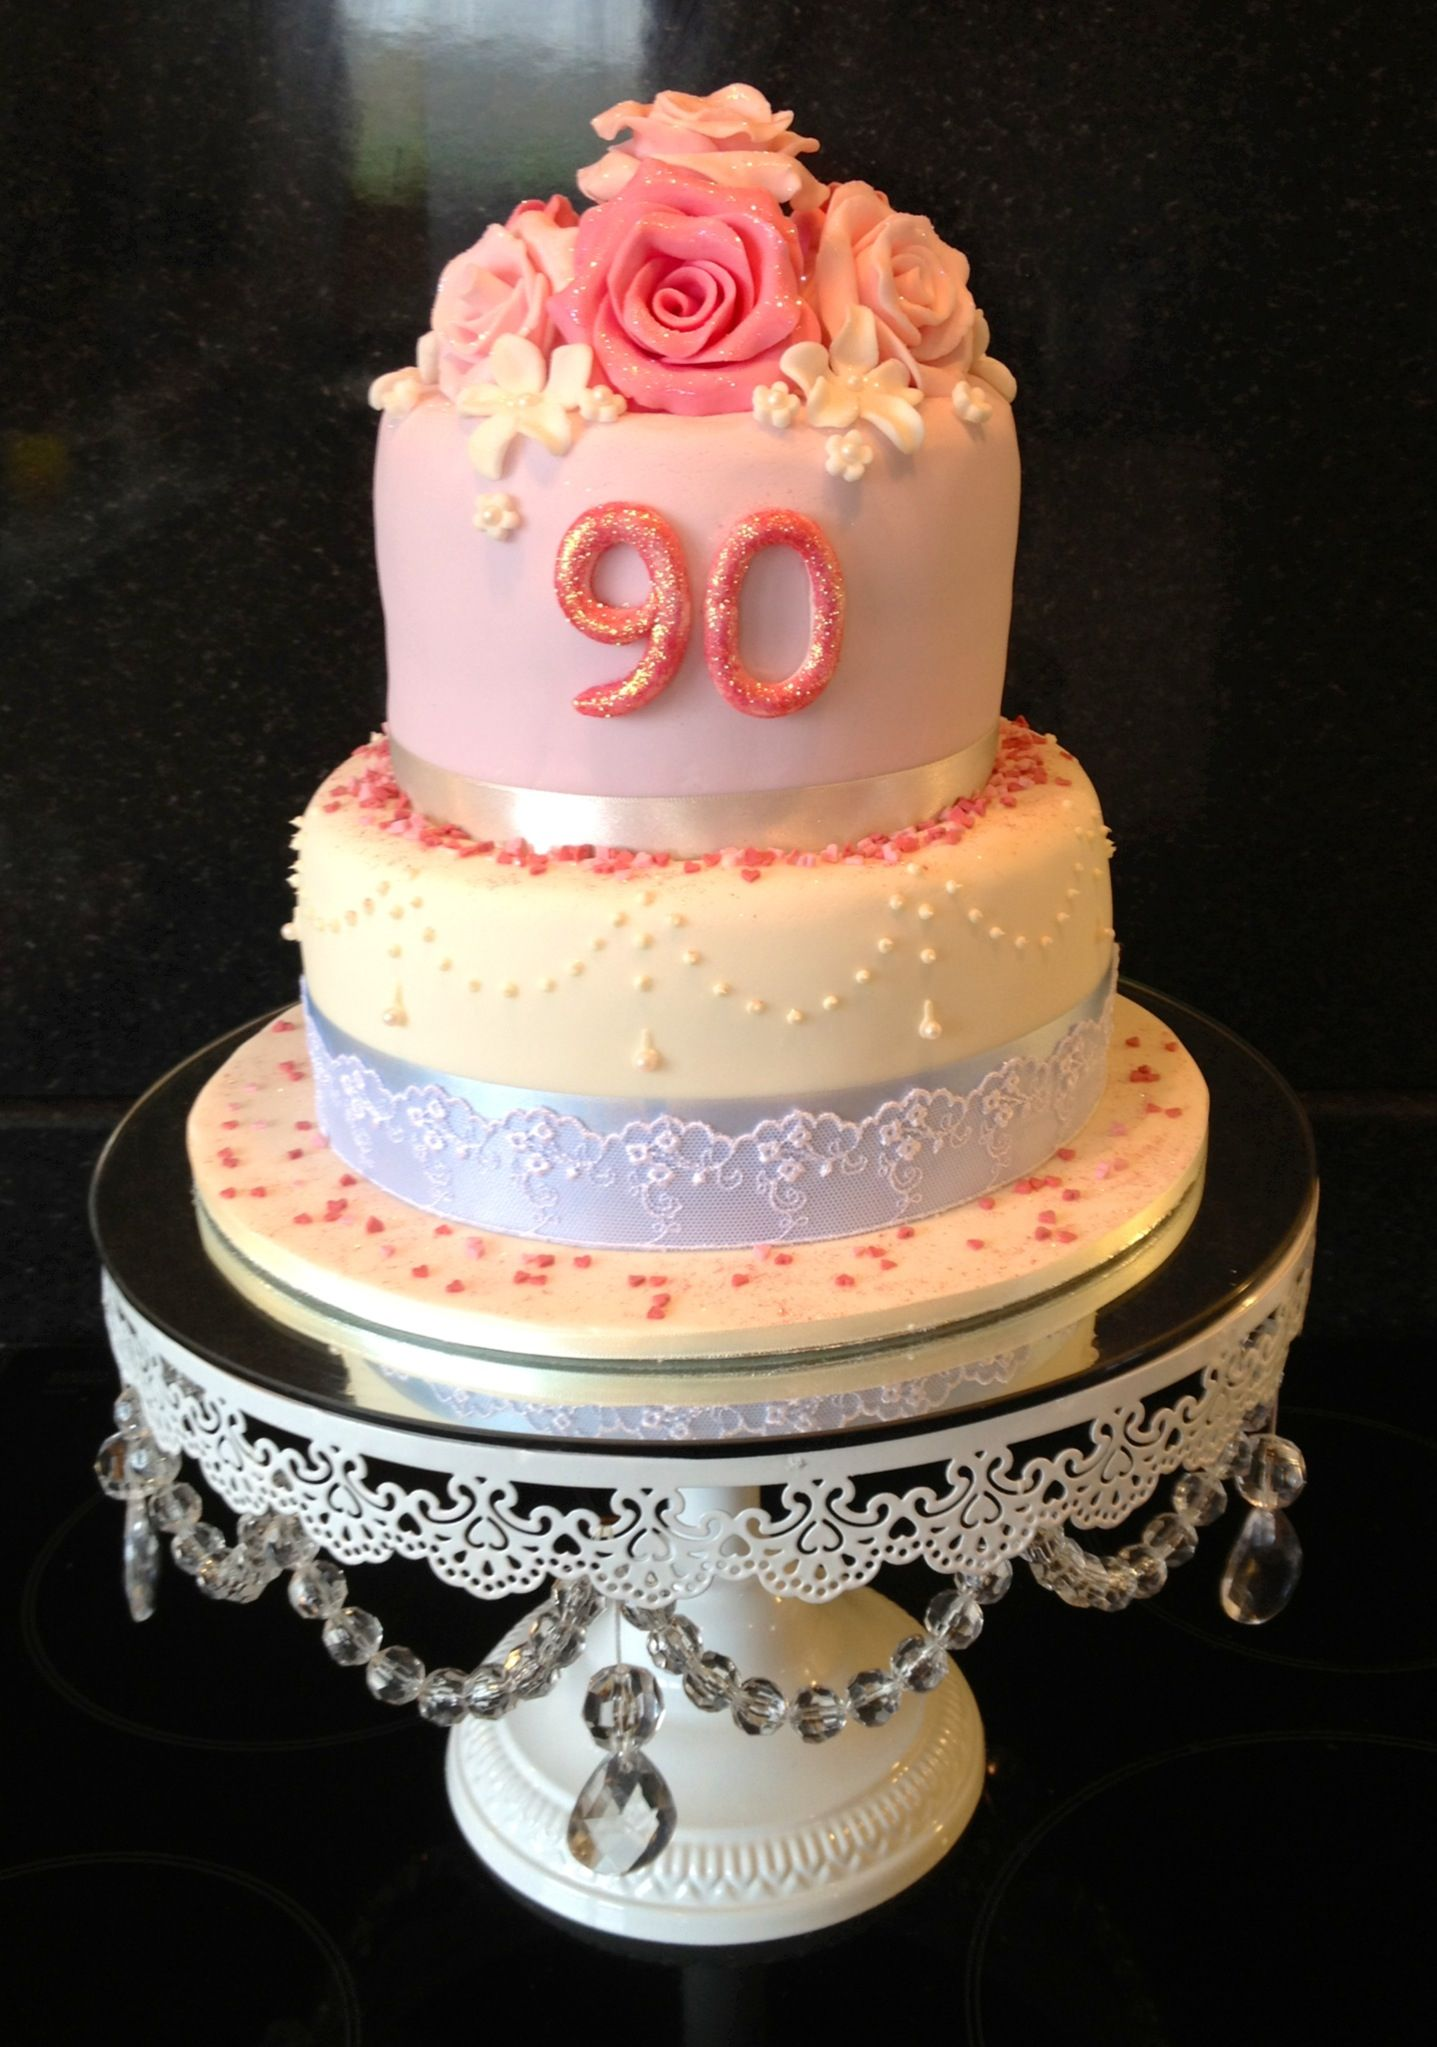 Enjoyable 90Th Birthday Cake 90Th Birthday Cakes New Birthday Cake 90Th Funny Birthday Cards Online Elaedamsfinfo